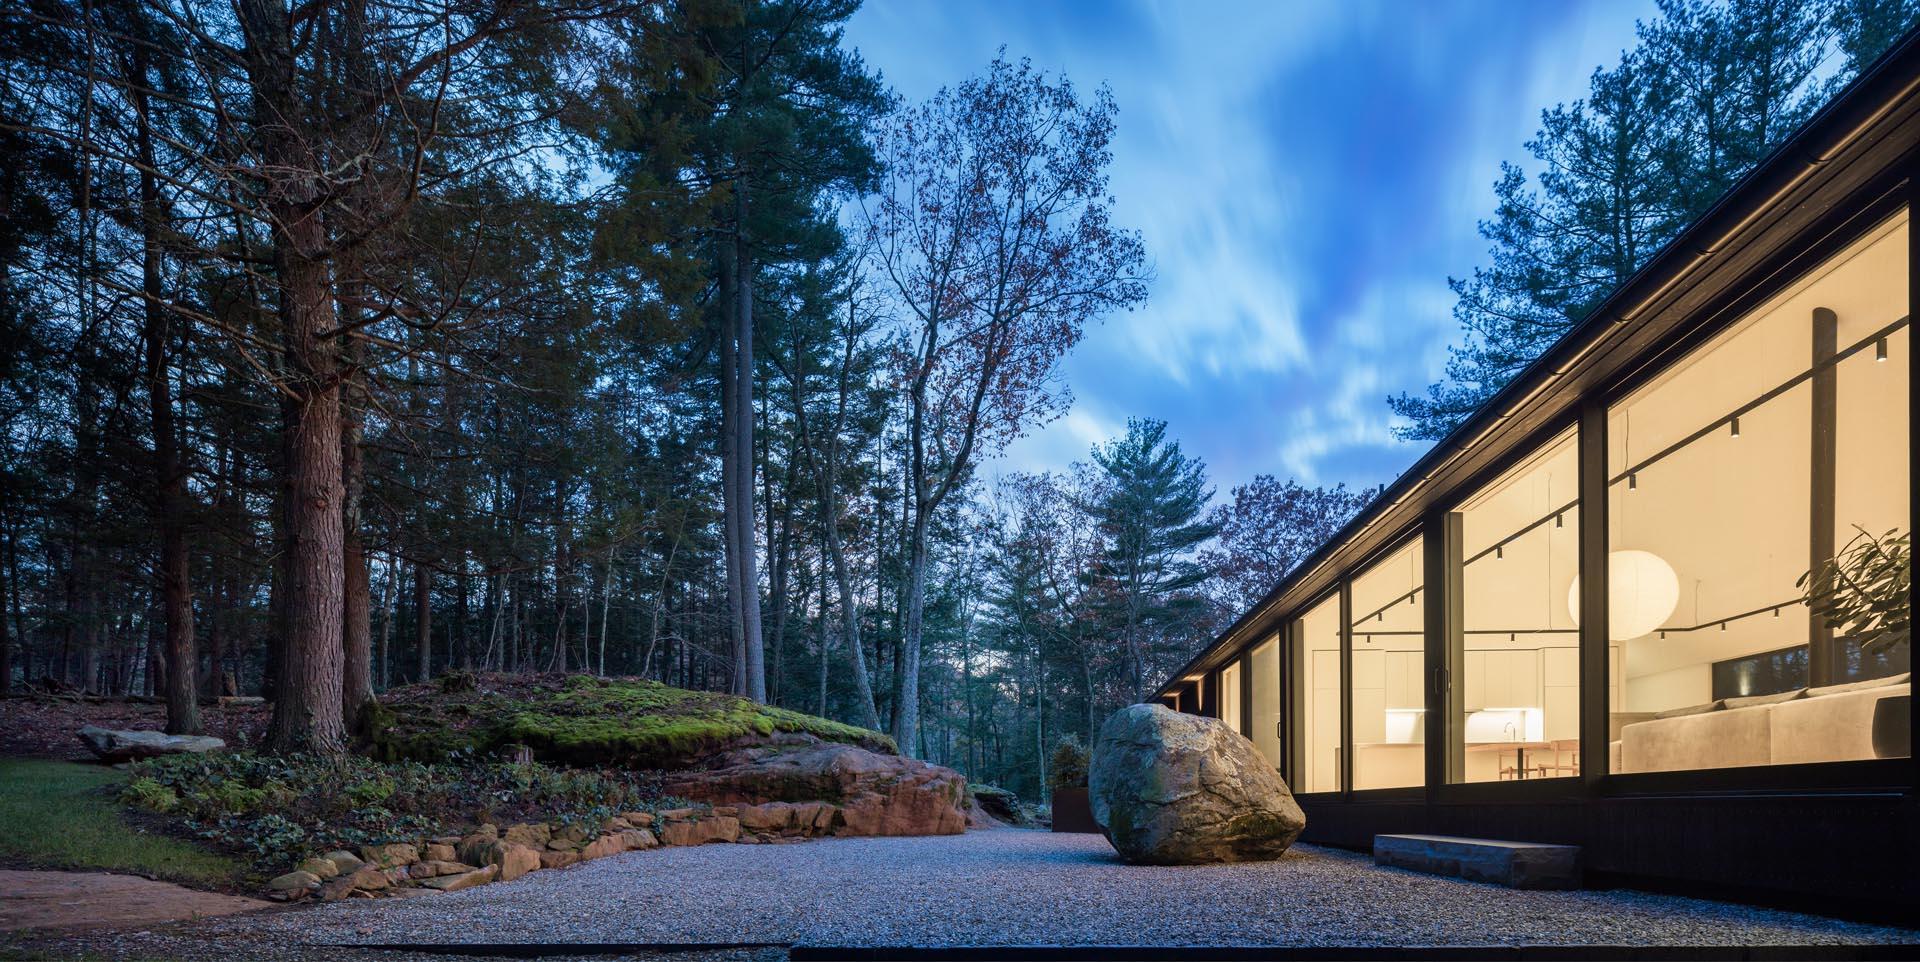 A modern house with a minimalist rock garden.